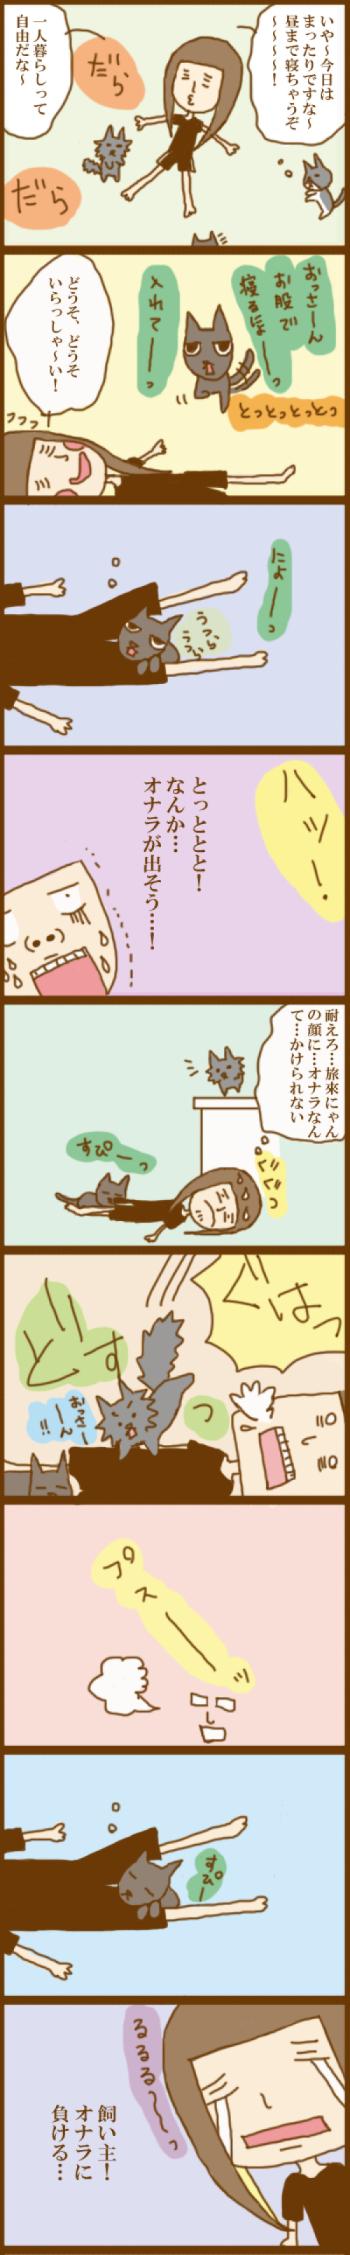 f:id:suzuokayu:20201119100858j:plain